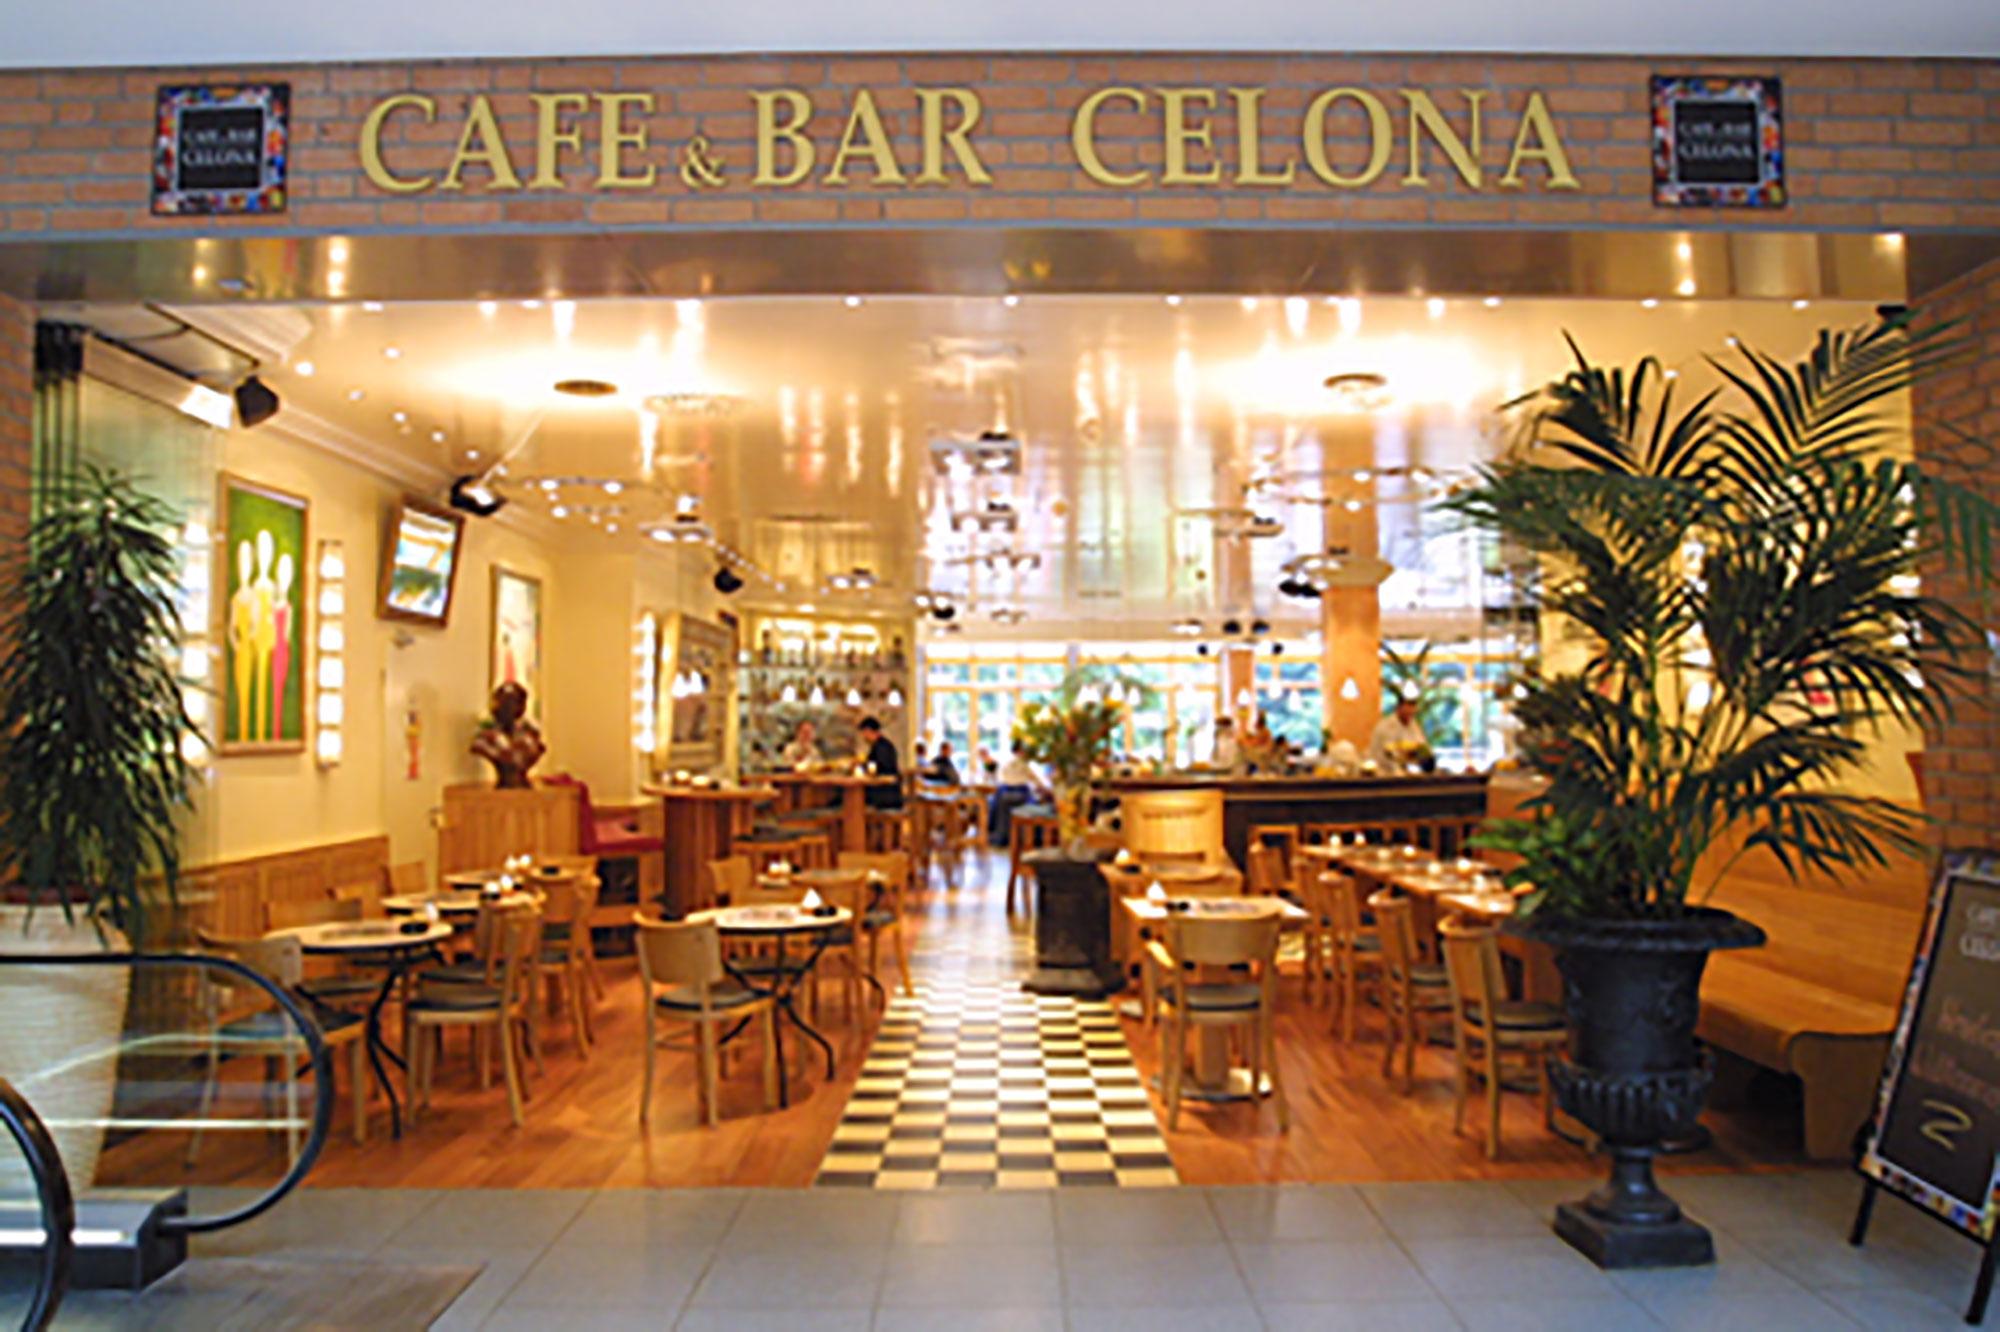 Cafe Bar Celona Nürnberg : cafe bar celona wilhelmshaven cafe bar celona ~ Watch28wear.com Haus und Dekorationen